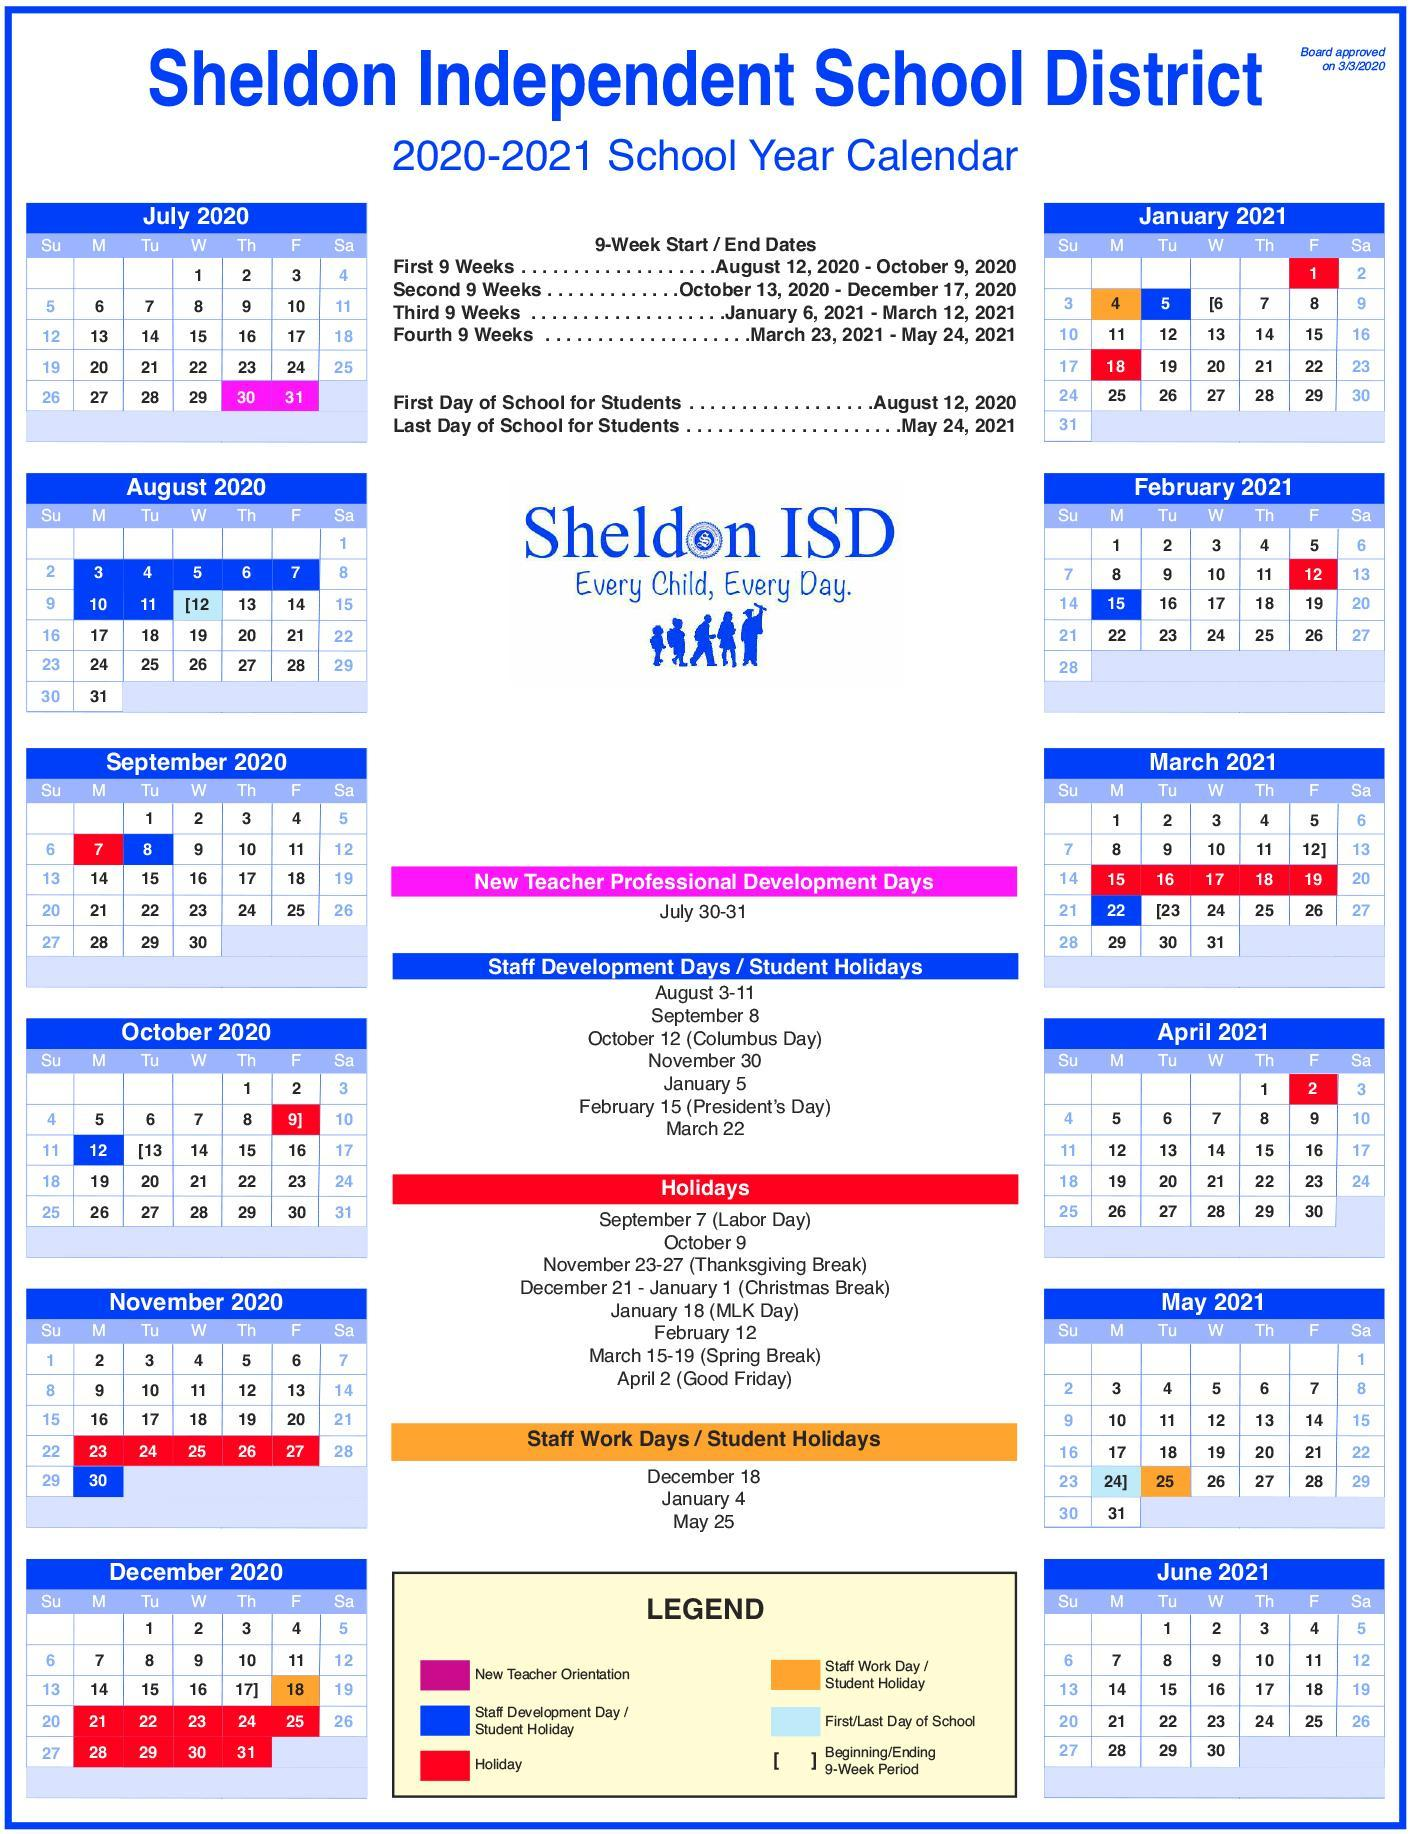 sheldon_isd_2020_2021_school_year_calendar_art